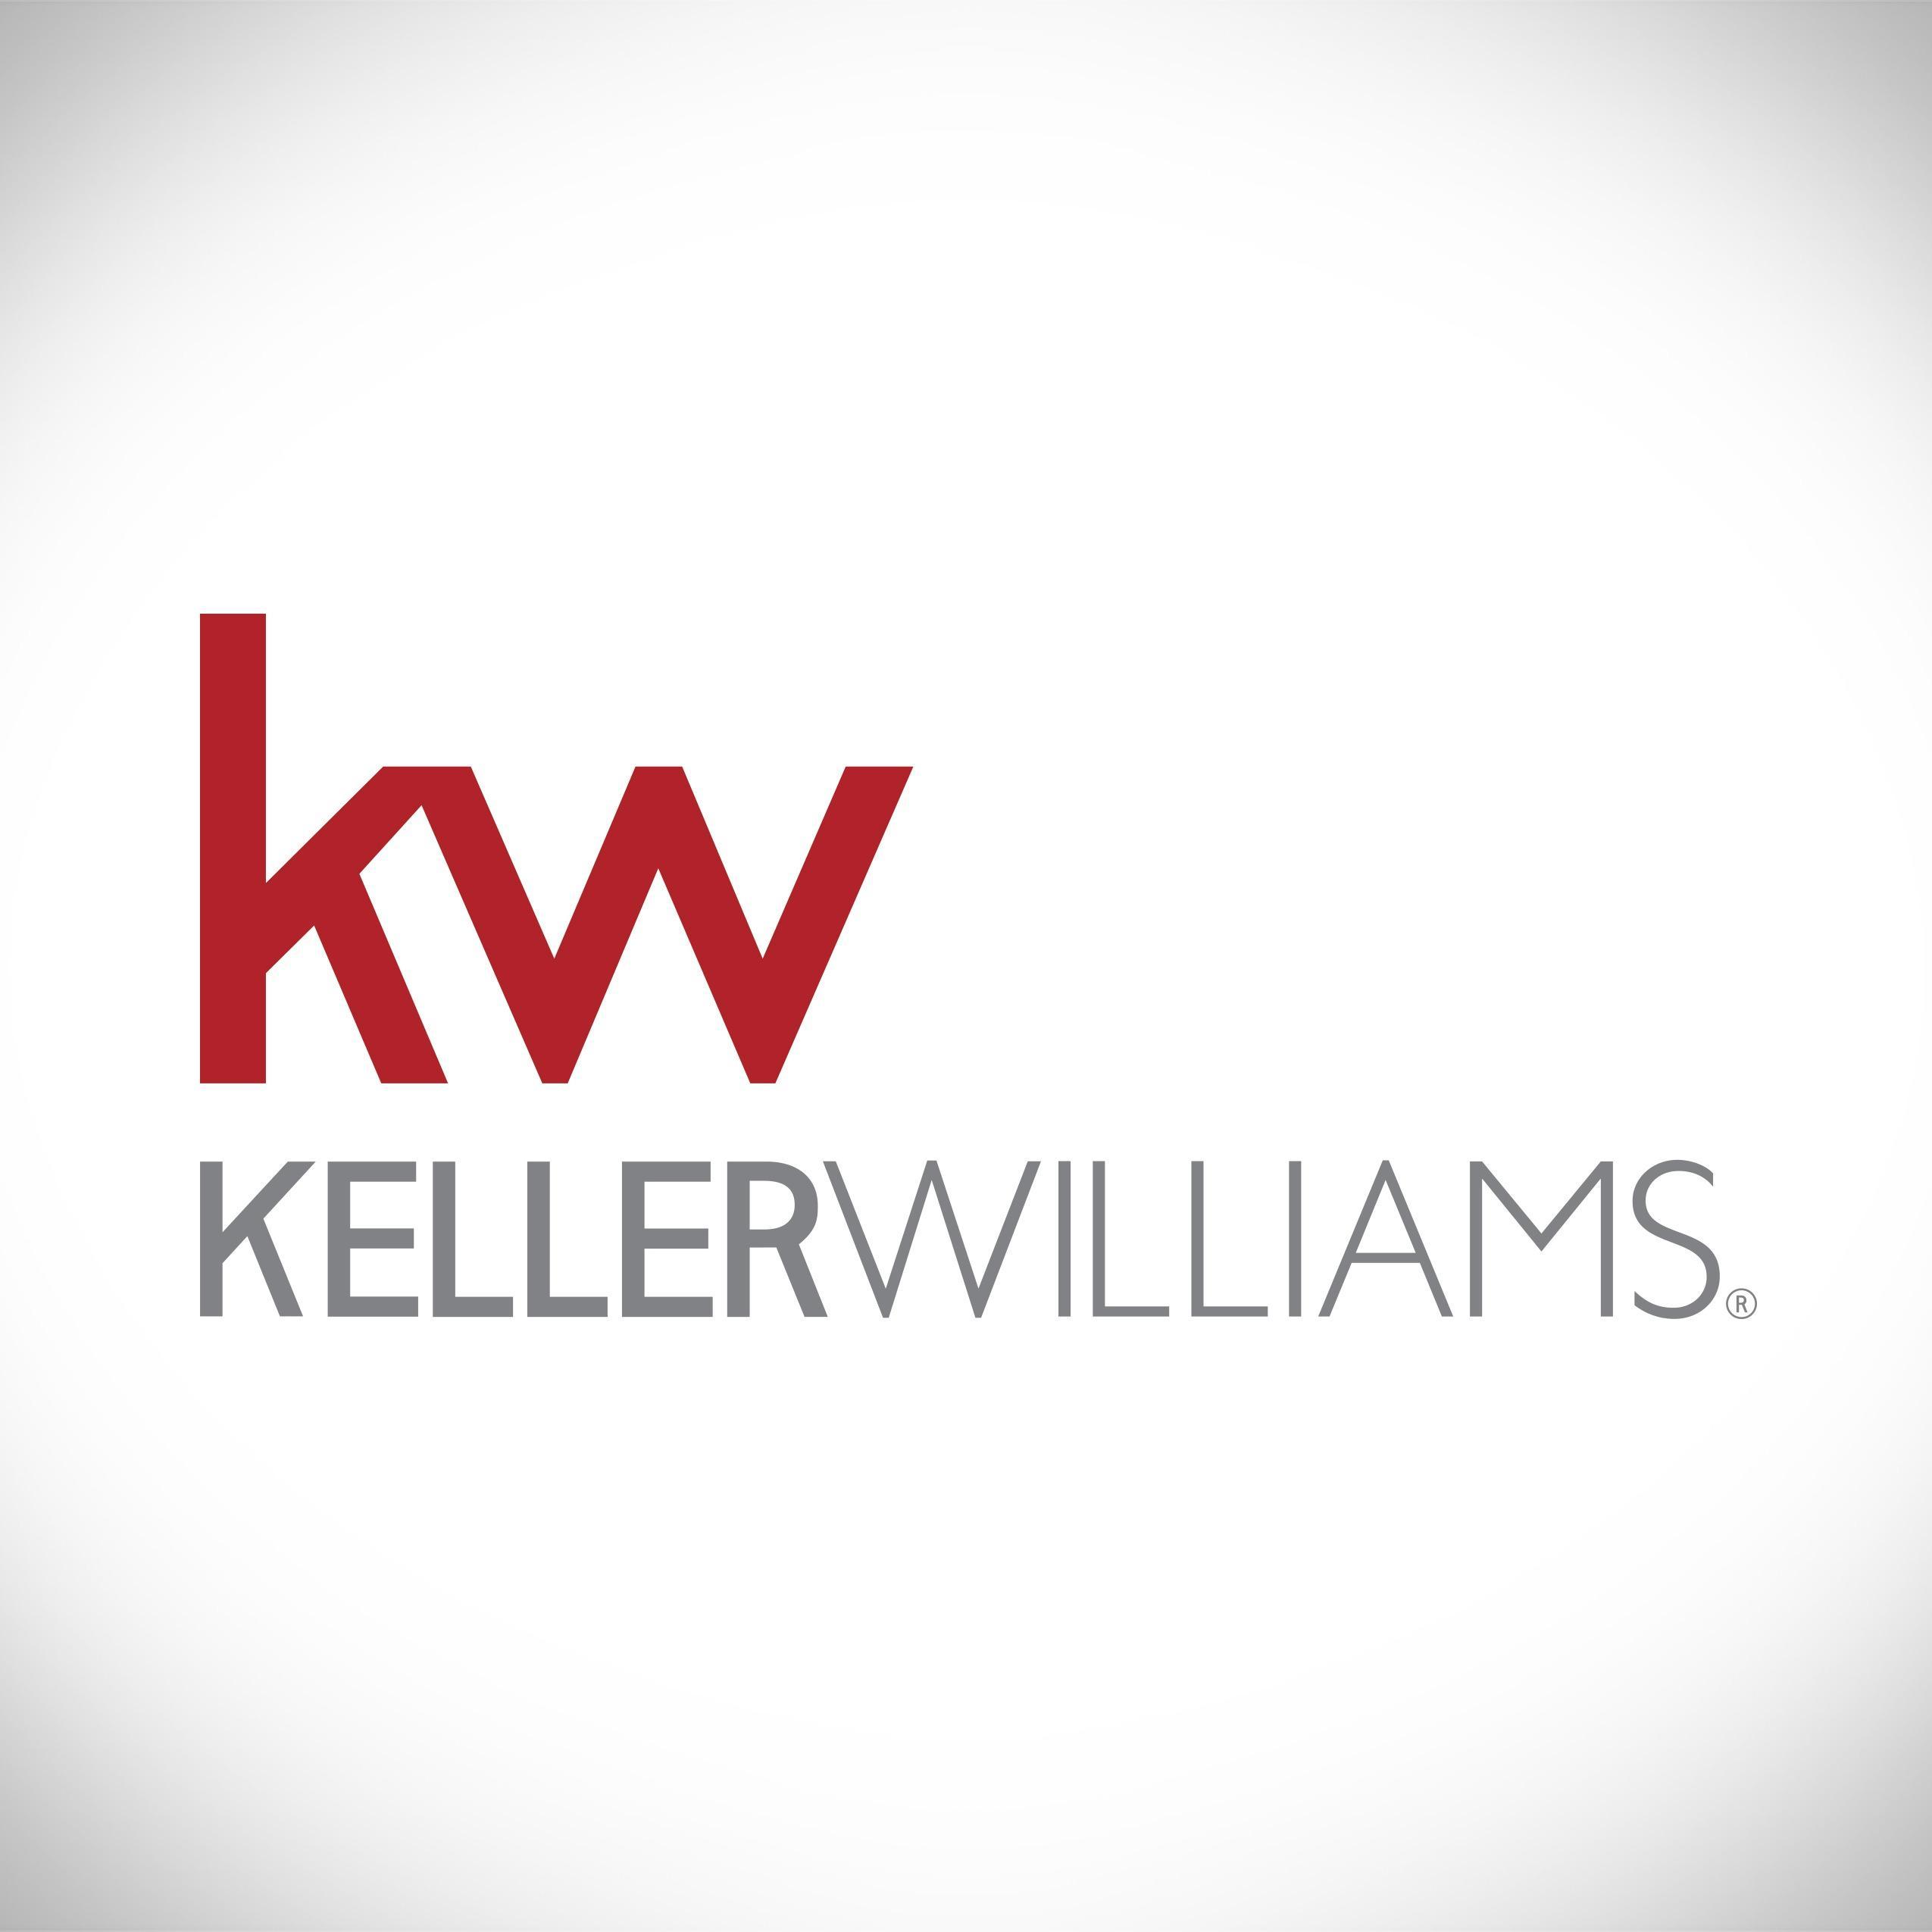 Keller Williams Realty - Perez Team Properties - Palmdale, CA - Real Estate Agents